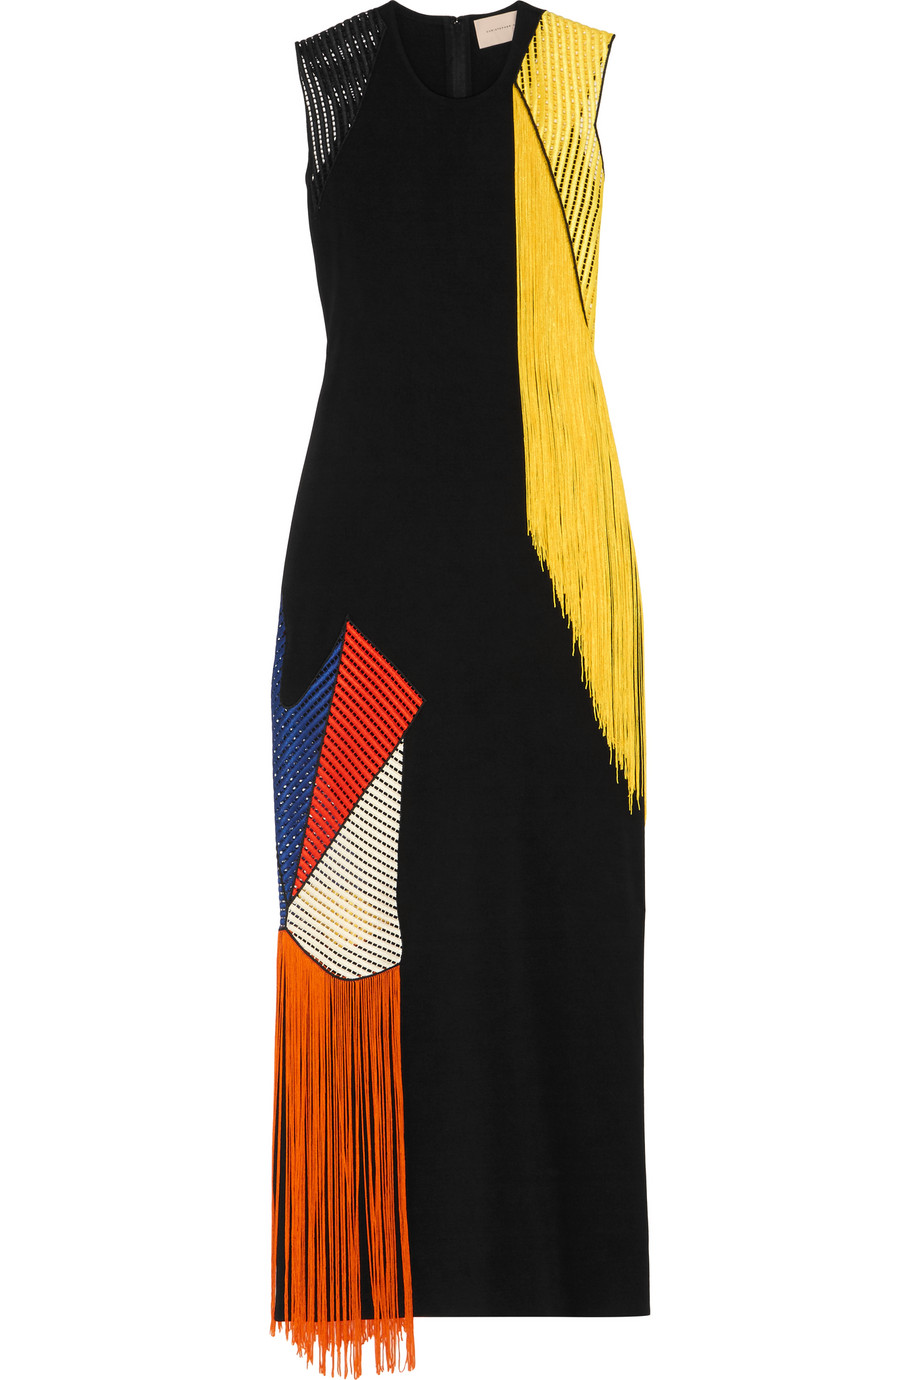 Fringed Crochet-Paneled Stretch-Crepe Maxi Dress, Christopher Kane, Black, Women's, Size: 6